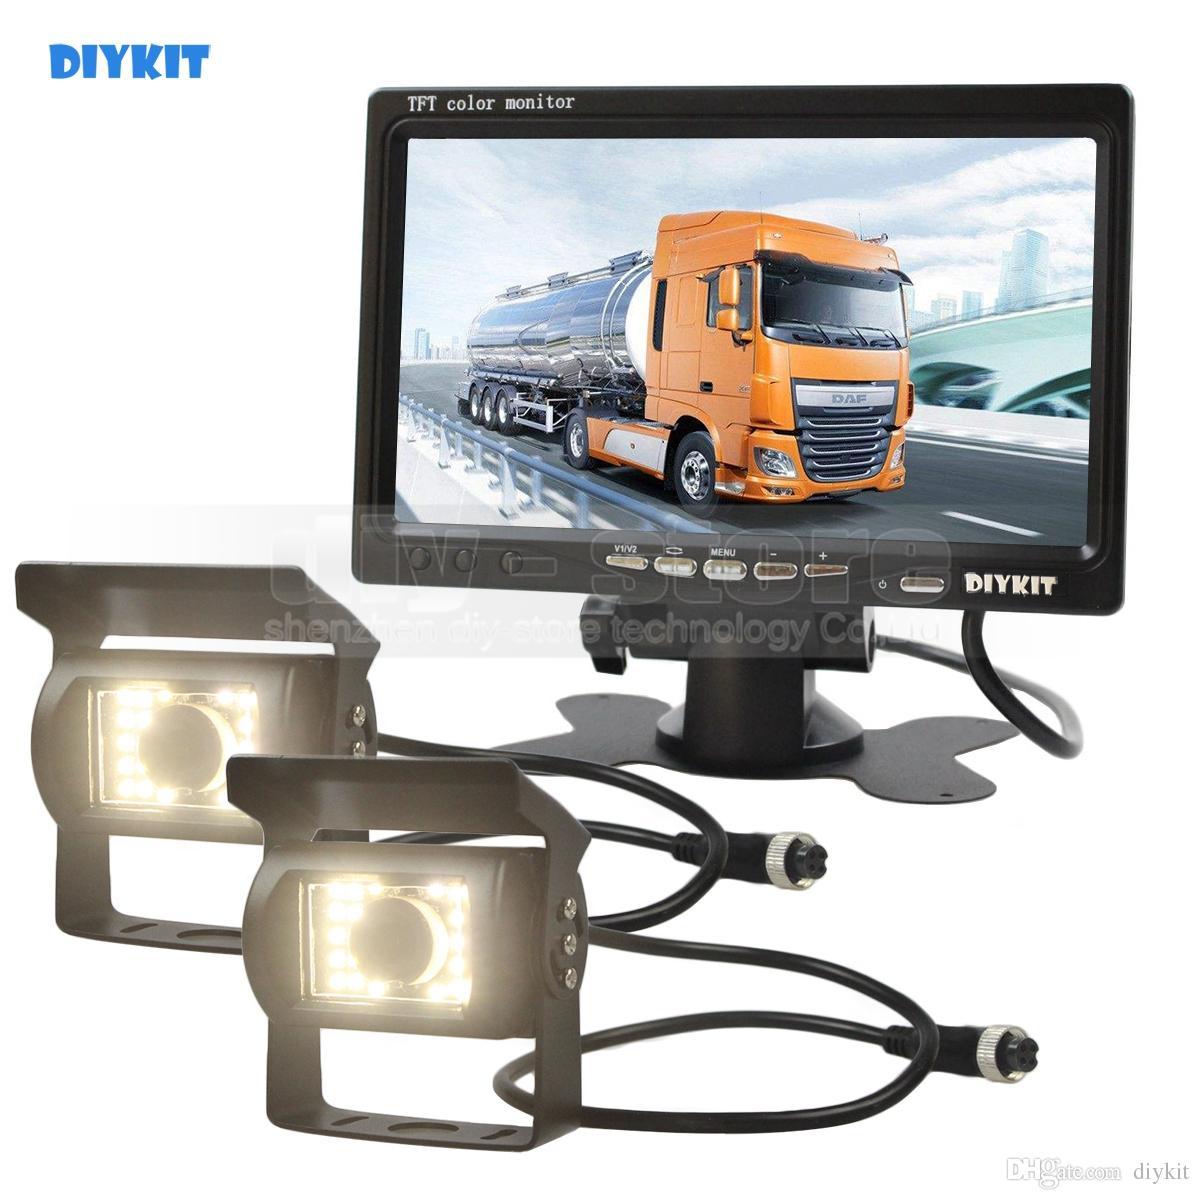 DIYKIT 2 x 4pin LED Night Vision CCD Rear View Camera + DC 12V-24V 7inch TFT LCD Car Monitor System for Bus Houseboat Truck